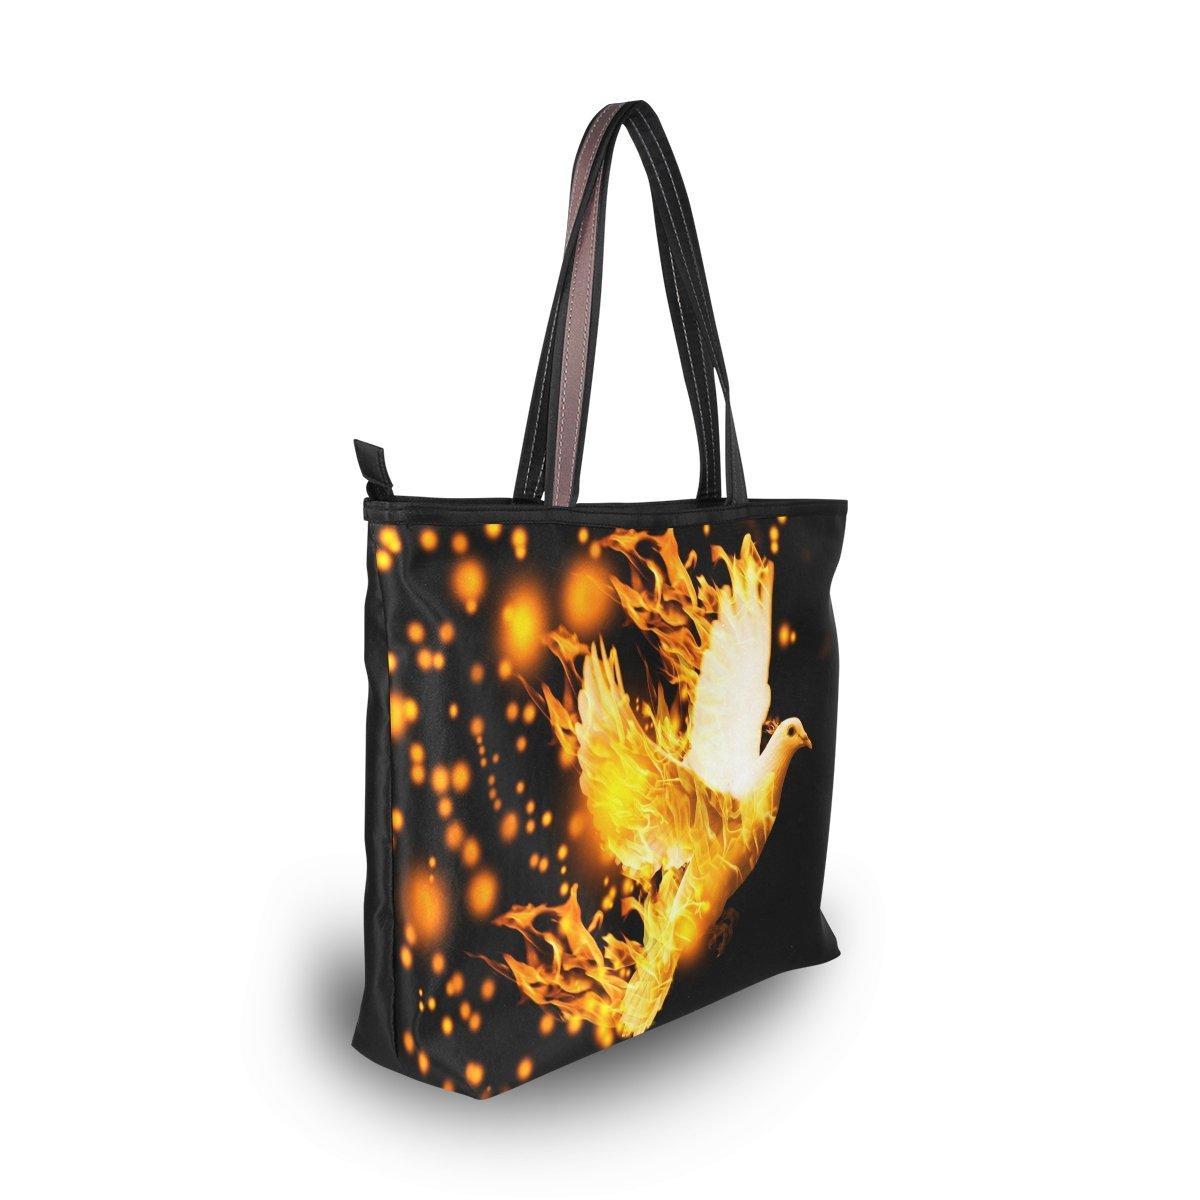 imobaby Flying Dove On Fire Women Large Tote Shoulder BagsTop Handle Handbag TE268